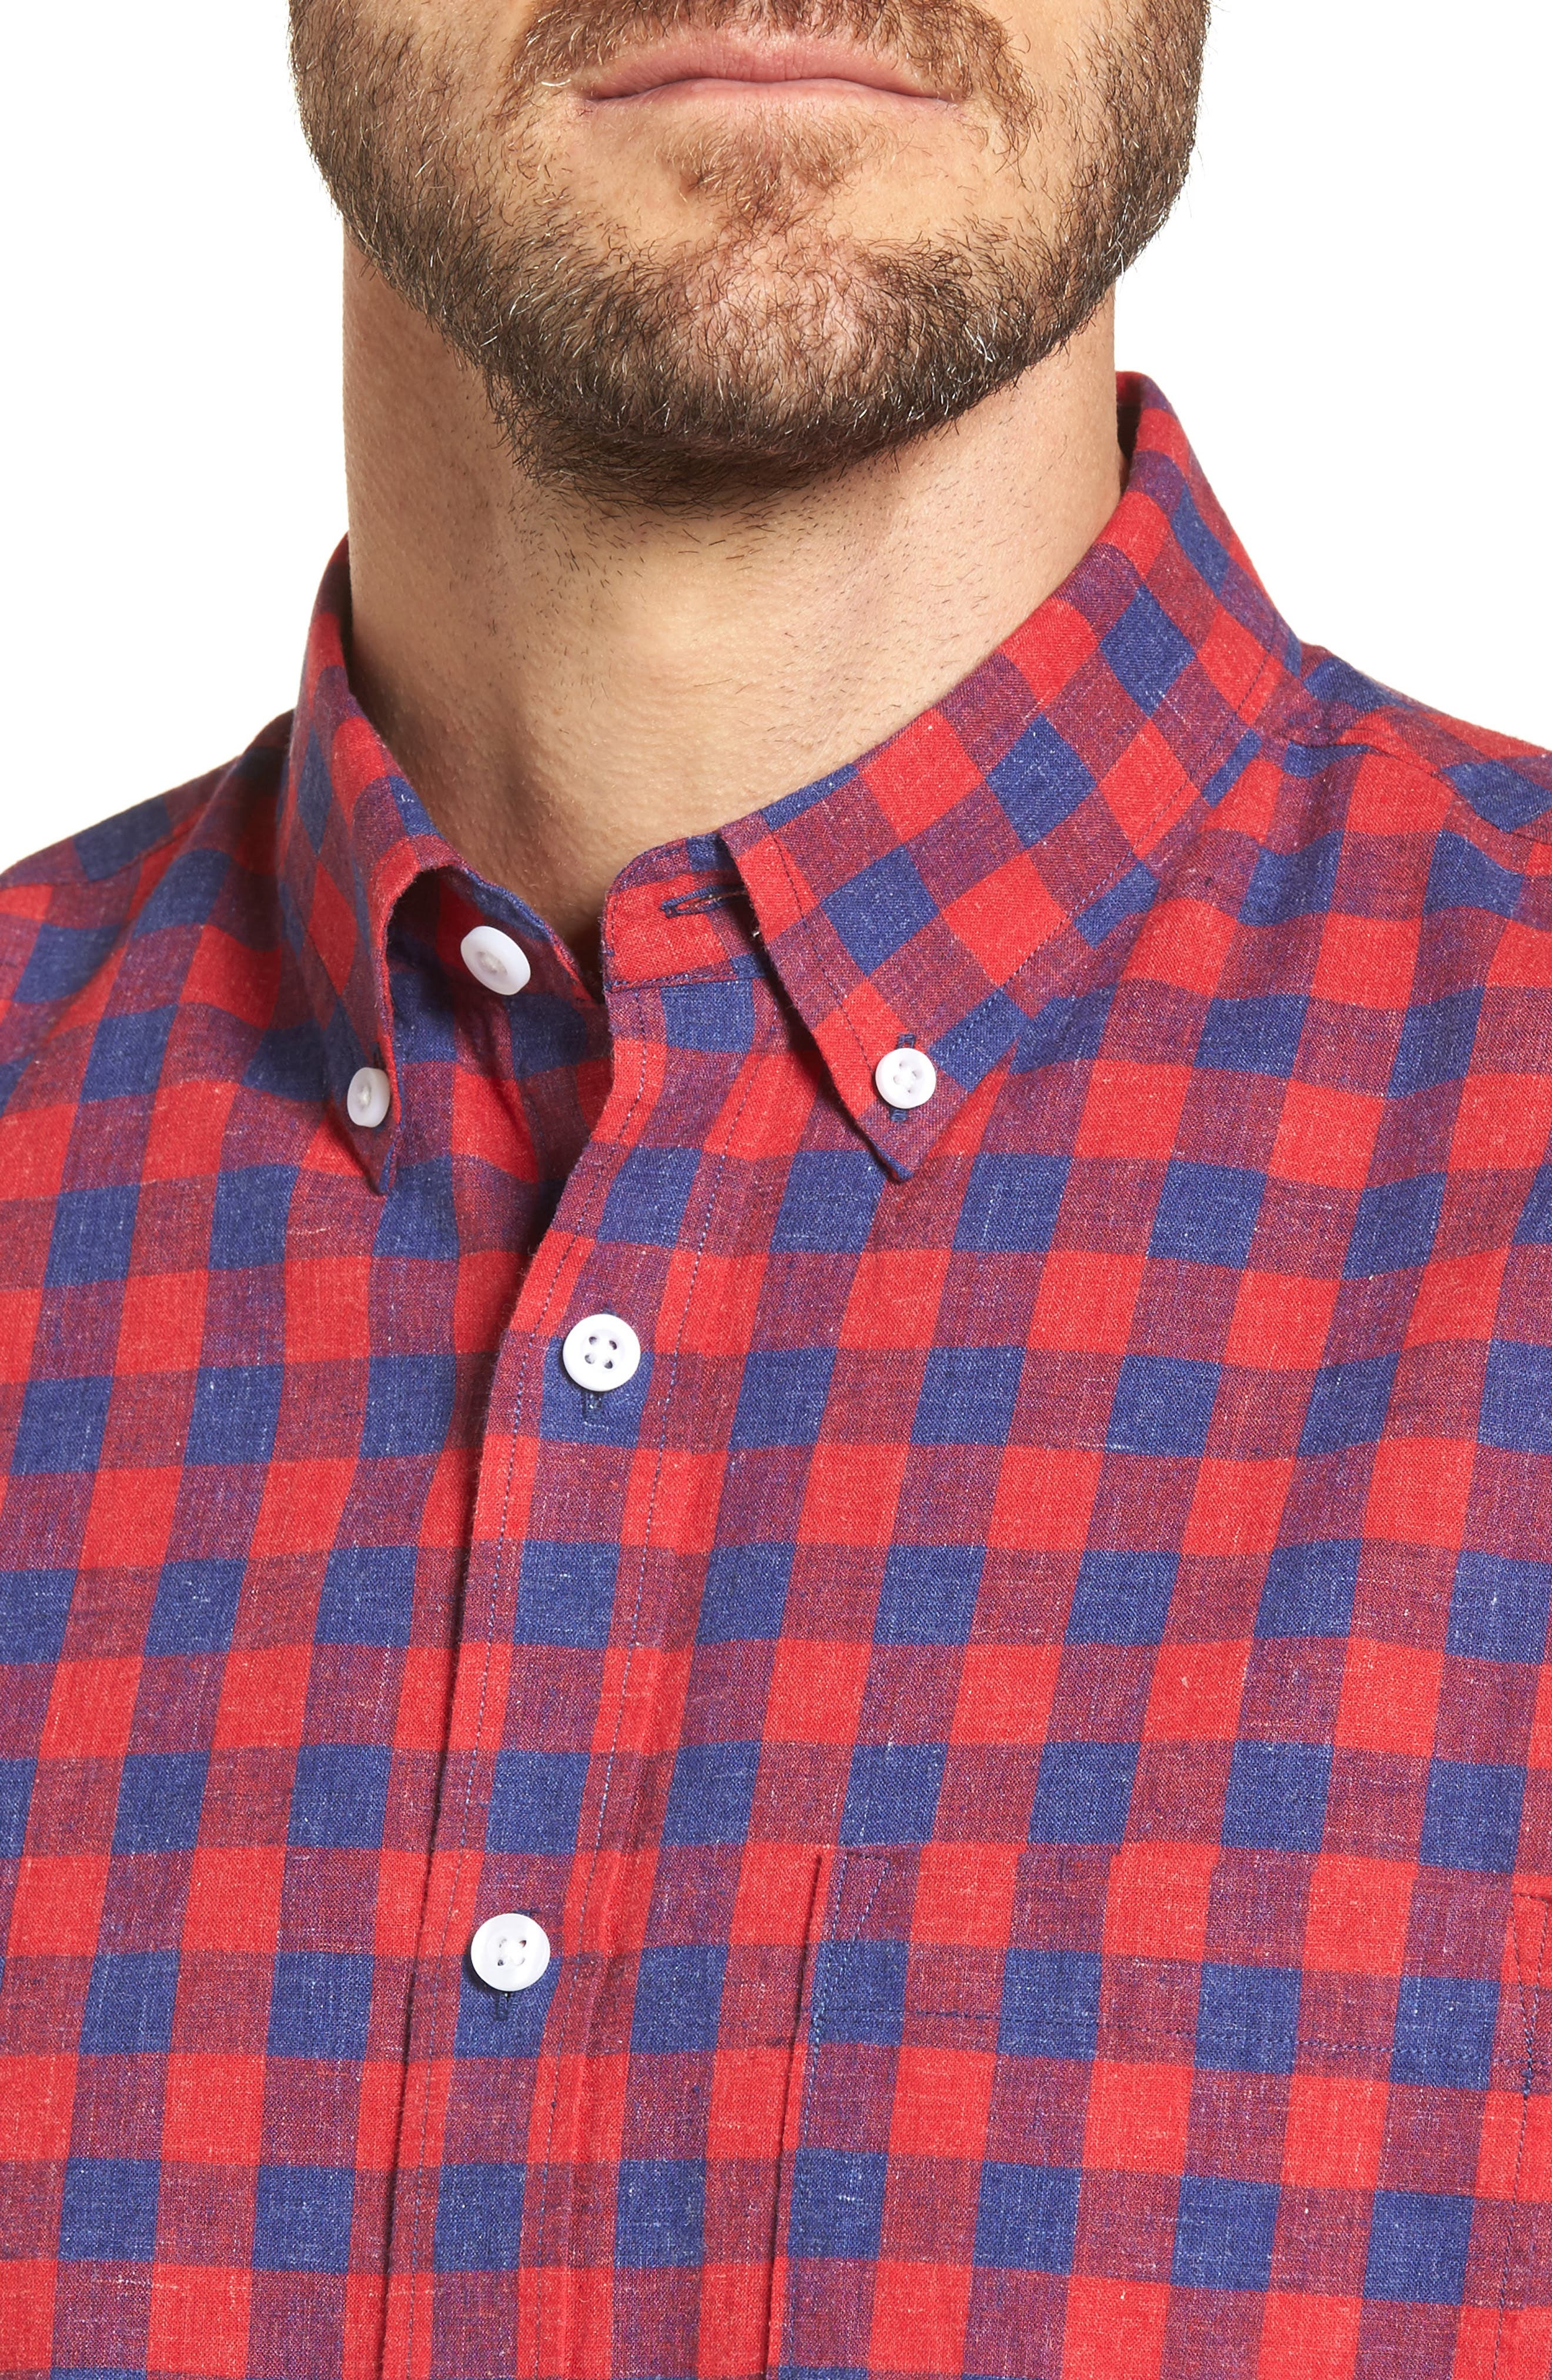 Spade Trim Fit Check Sport Shirt,                             Alternate thumbnail 4, color,                             610